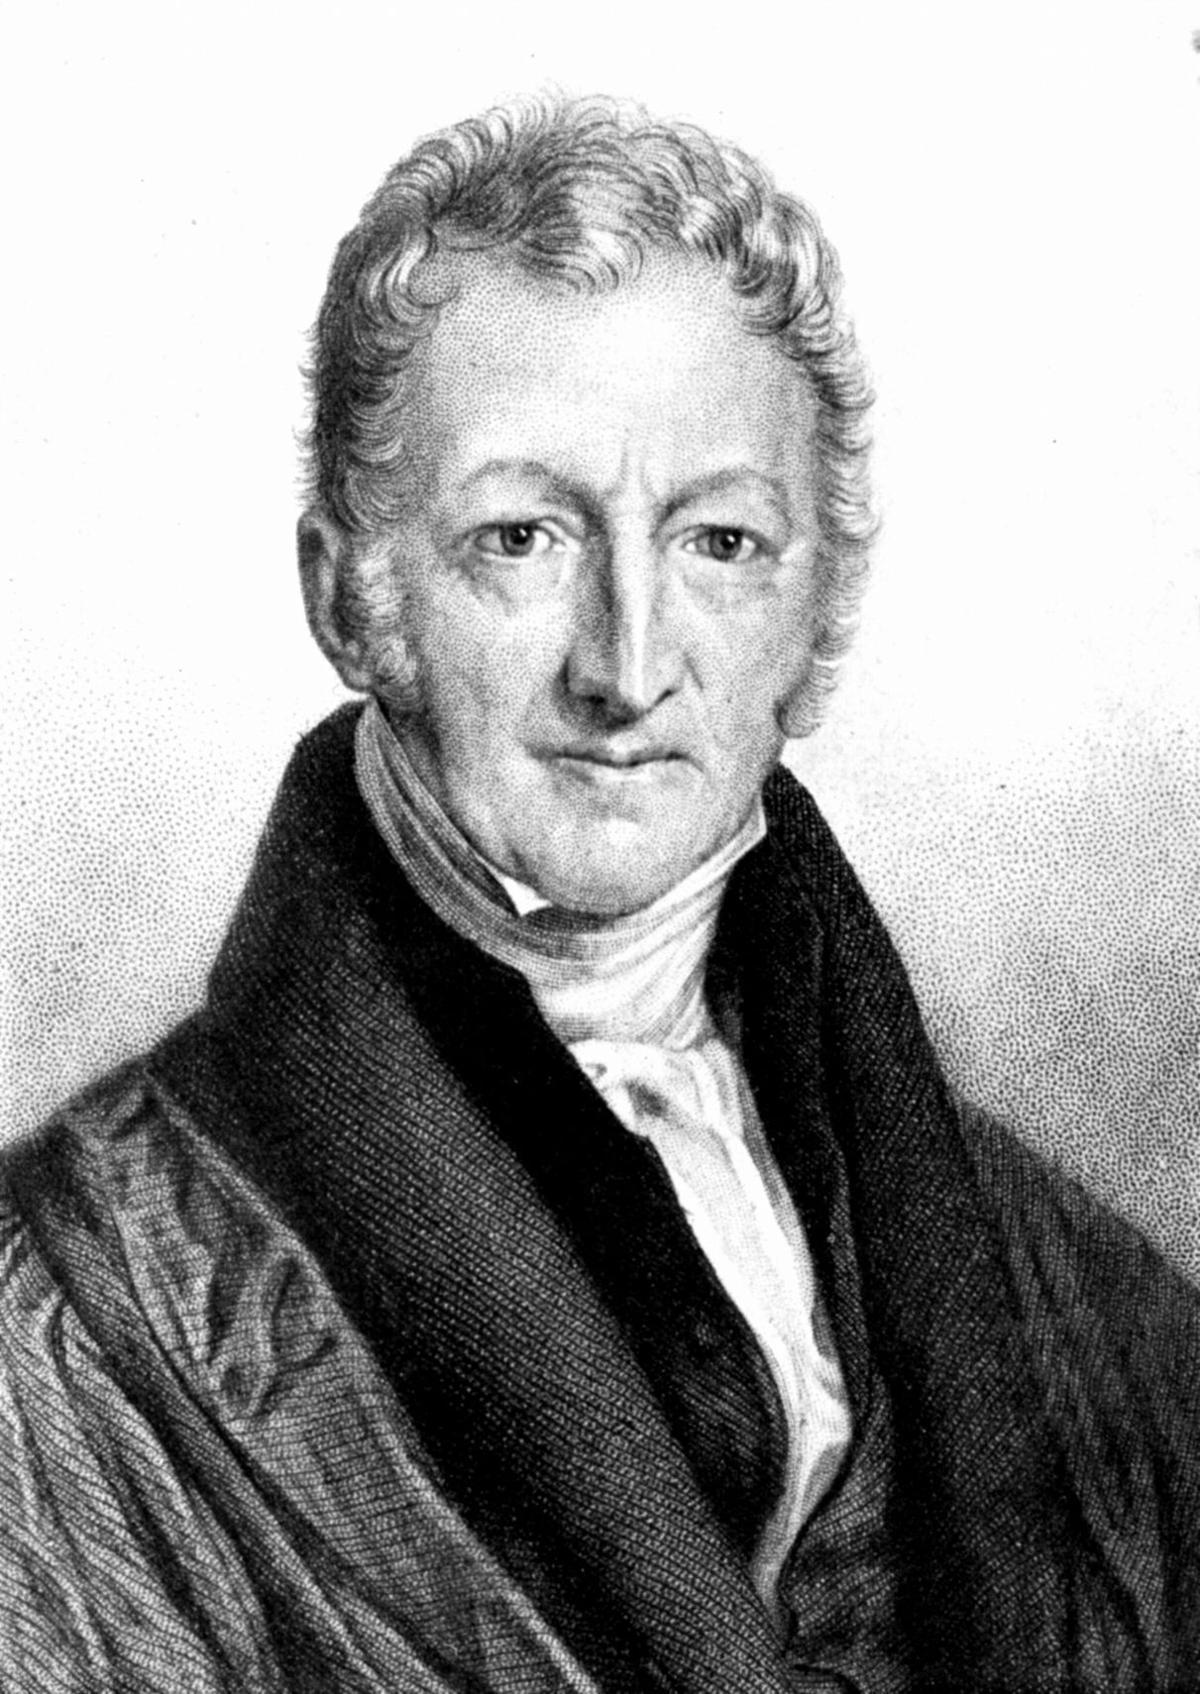 Portrait of Thomas Robert Malthus